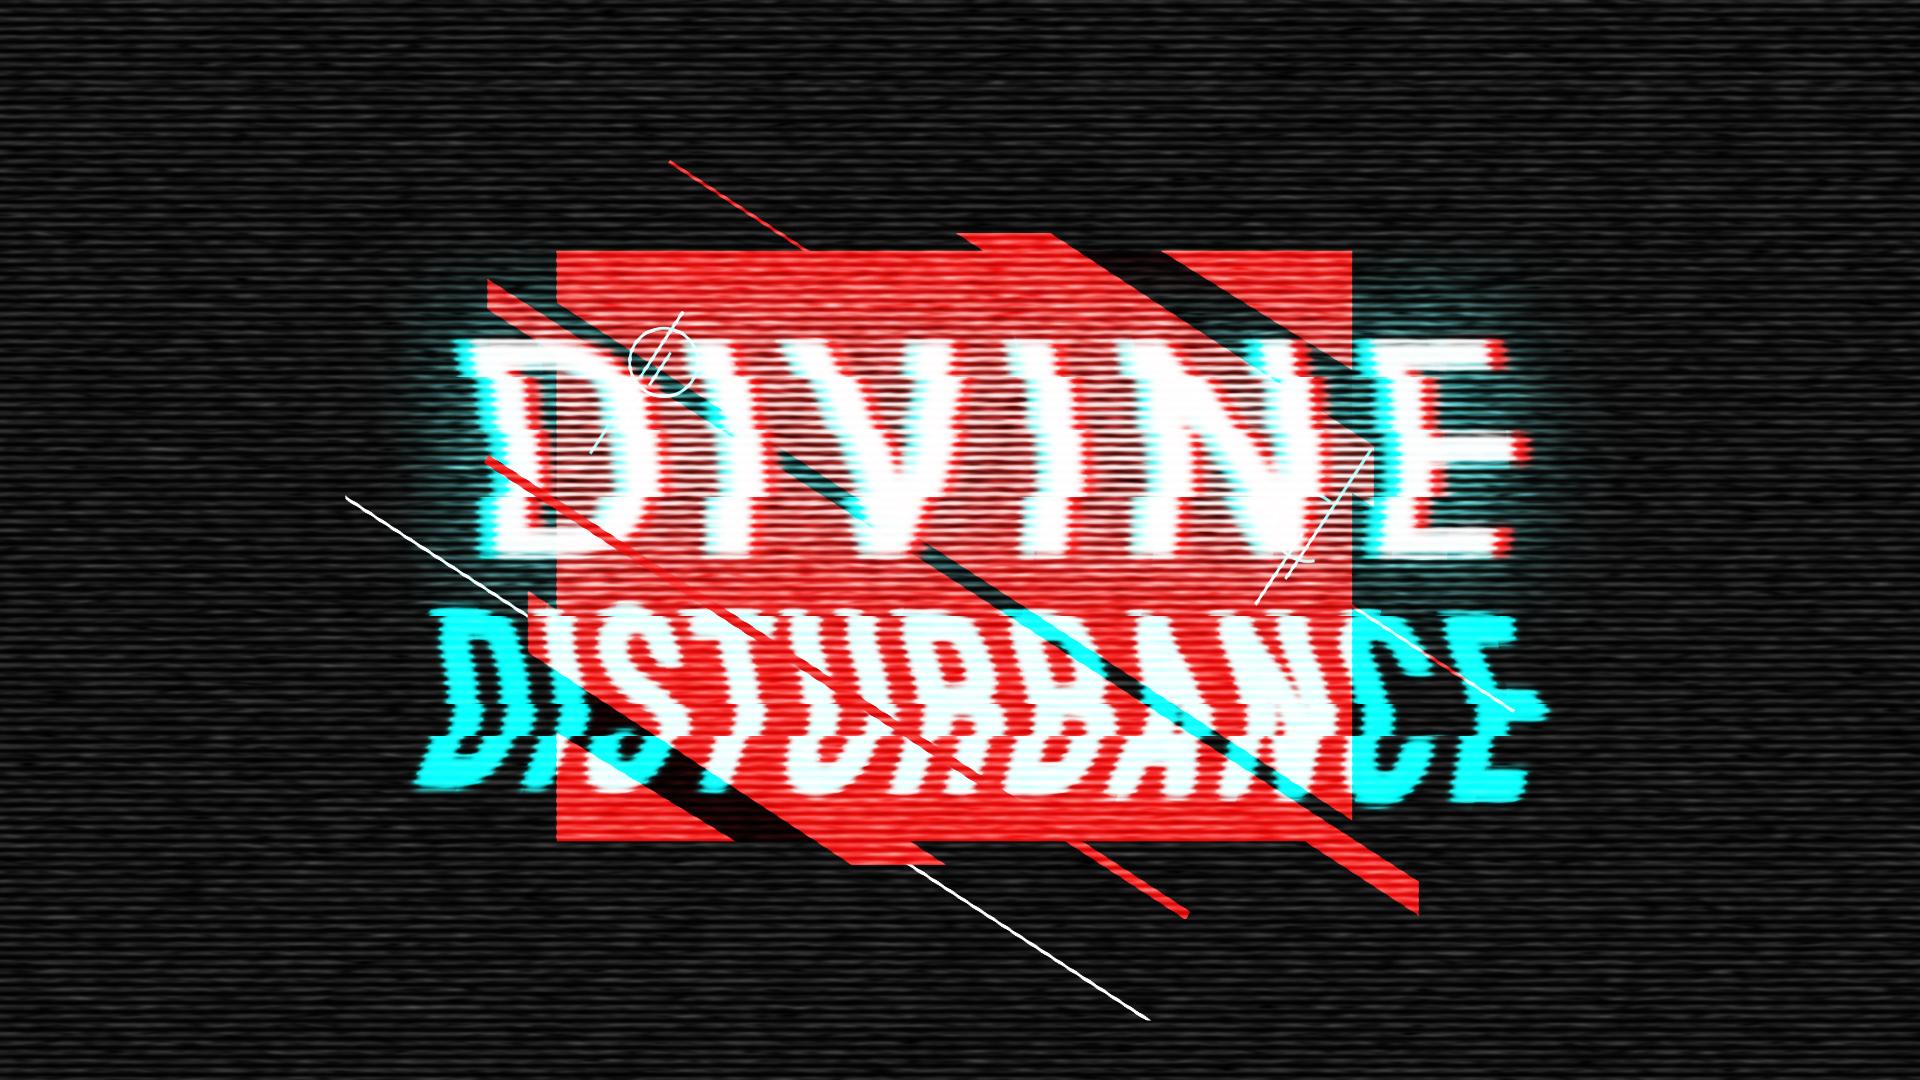 DivineDisturbance_title.jpg